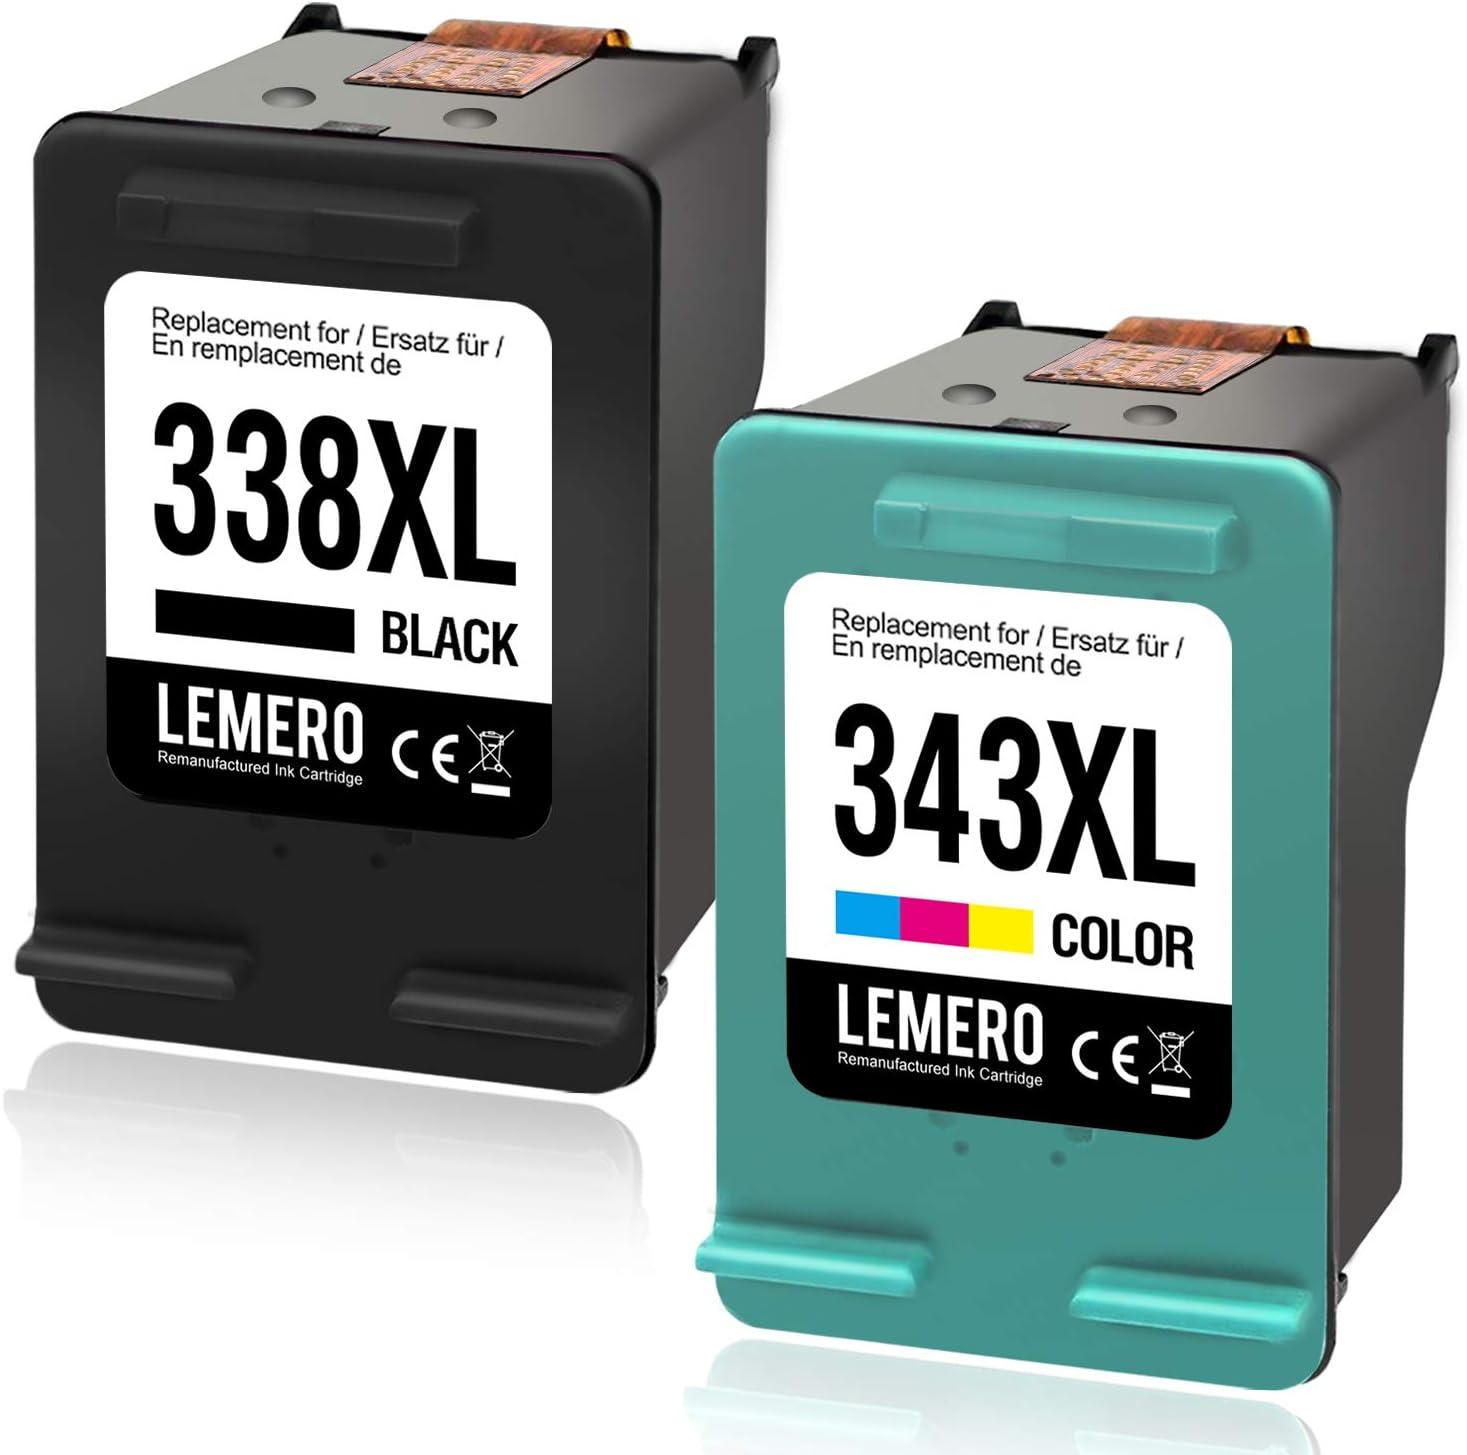 Lemero Reemplazo 338XL 343XL remanufacturado para cartuchos de tinta HP 338 XL 343 XL para HP Photosmart C3180,2710,7850,8150,PSC,1610,2355,OfficeJet 100,150 Negro: Amazon.es: Oficina y papelería